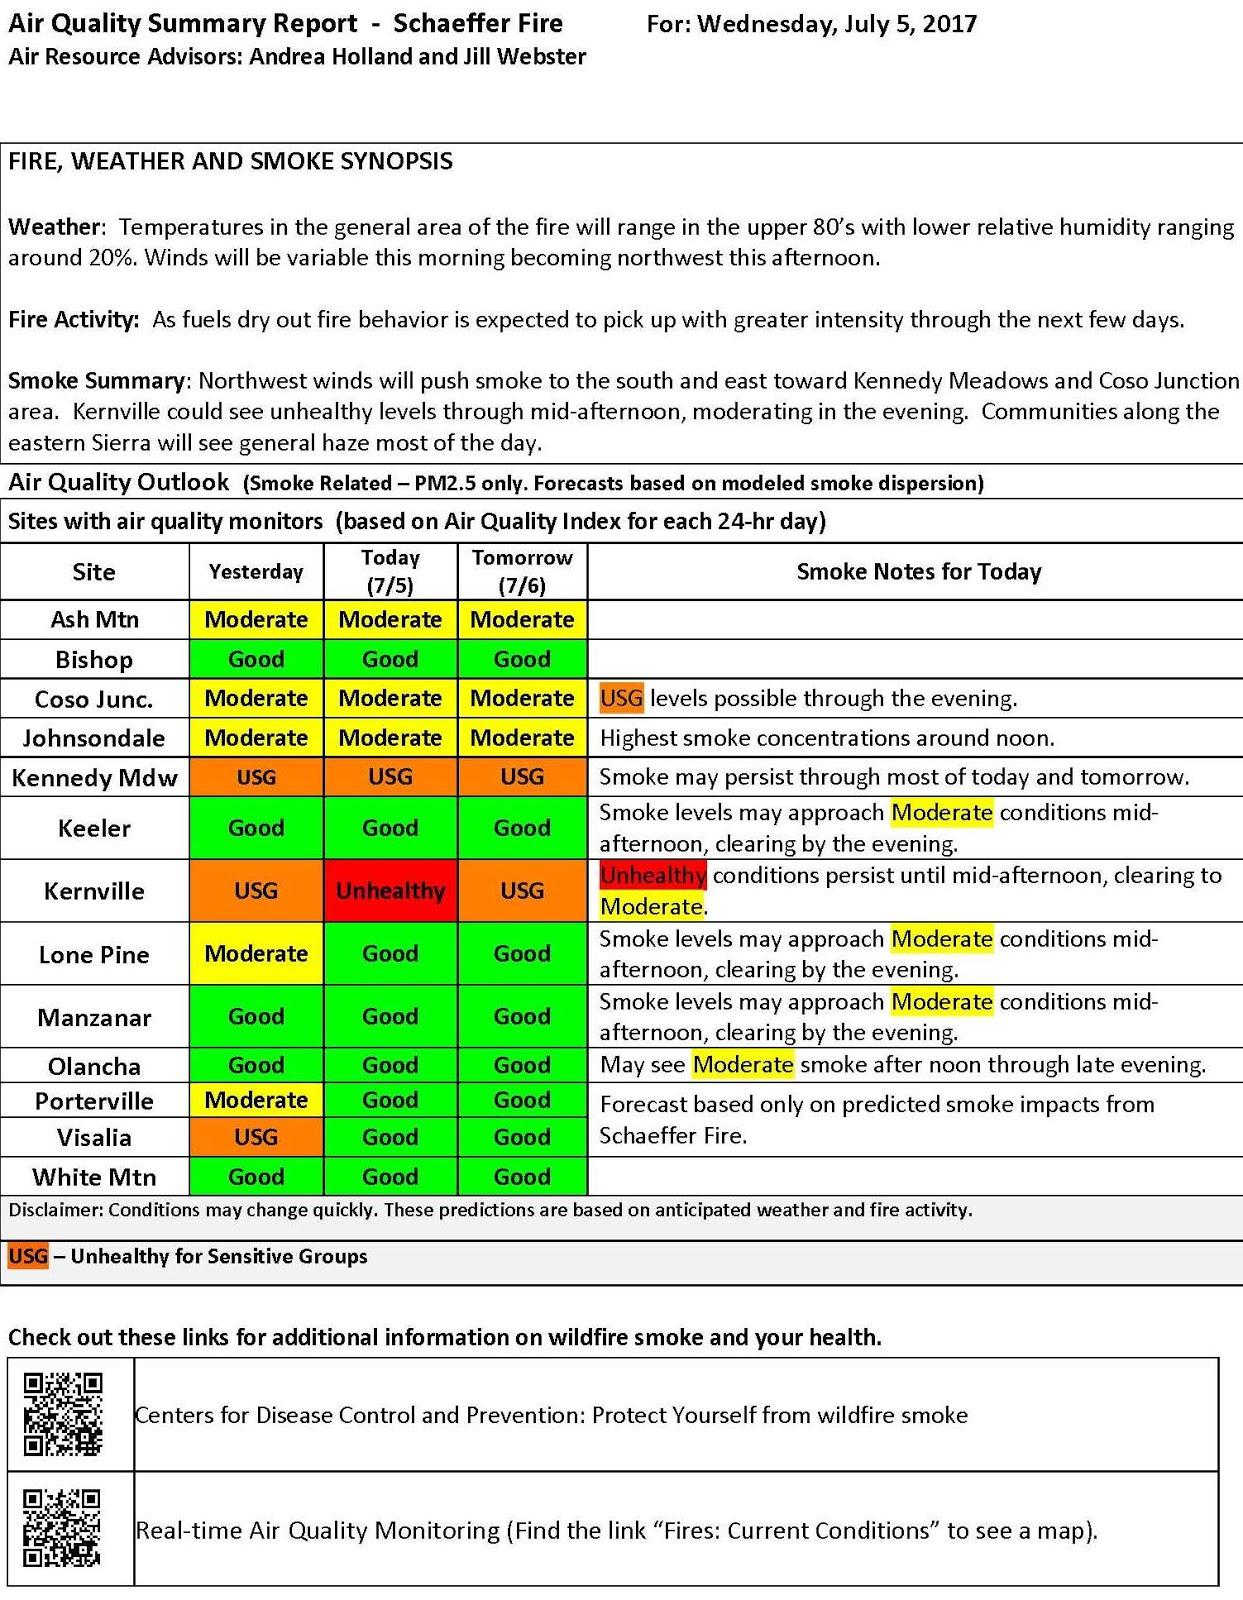 wednesday july 5 2017 schaeffer fire air quality summary